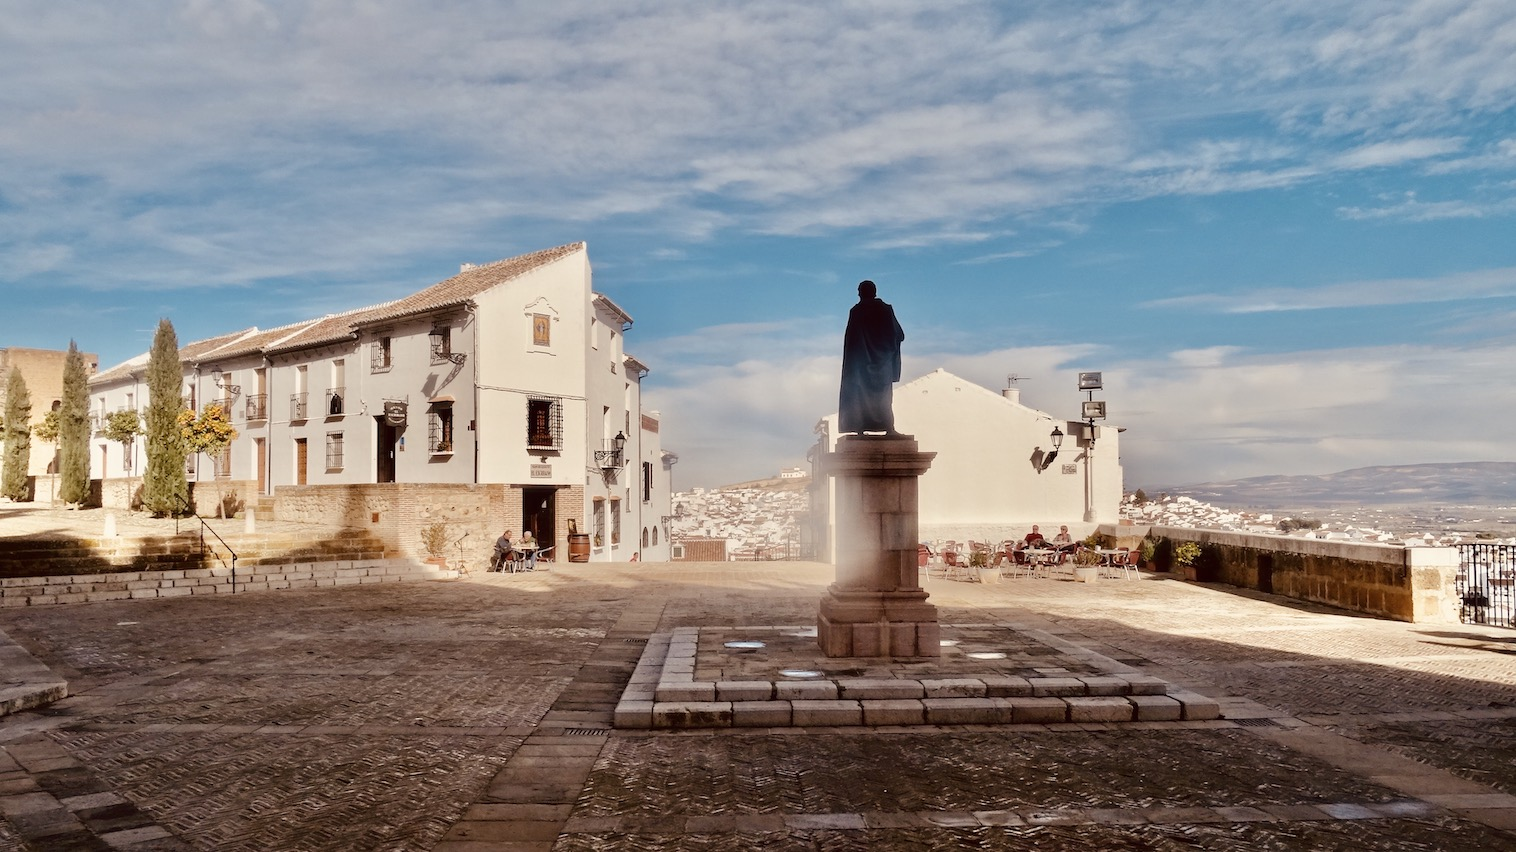 Plaza de Santa Maria Antequera.